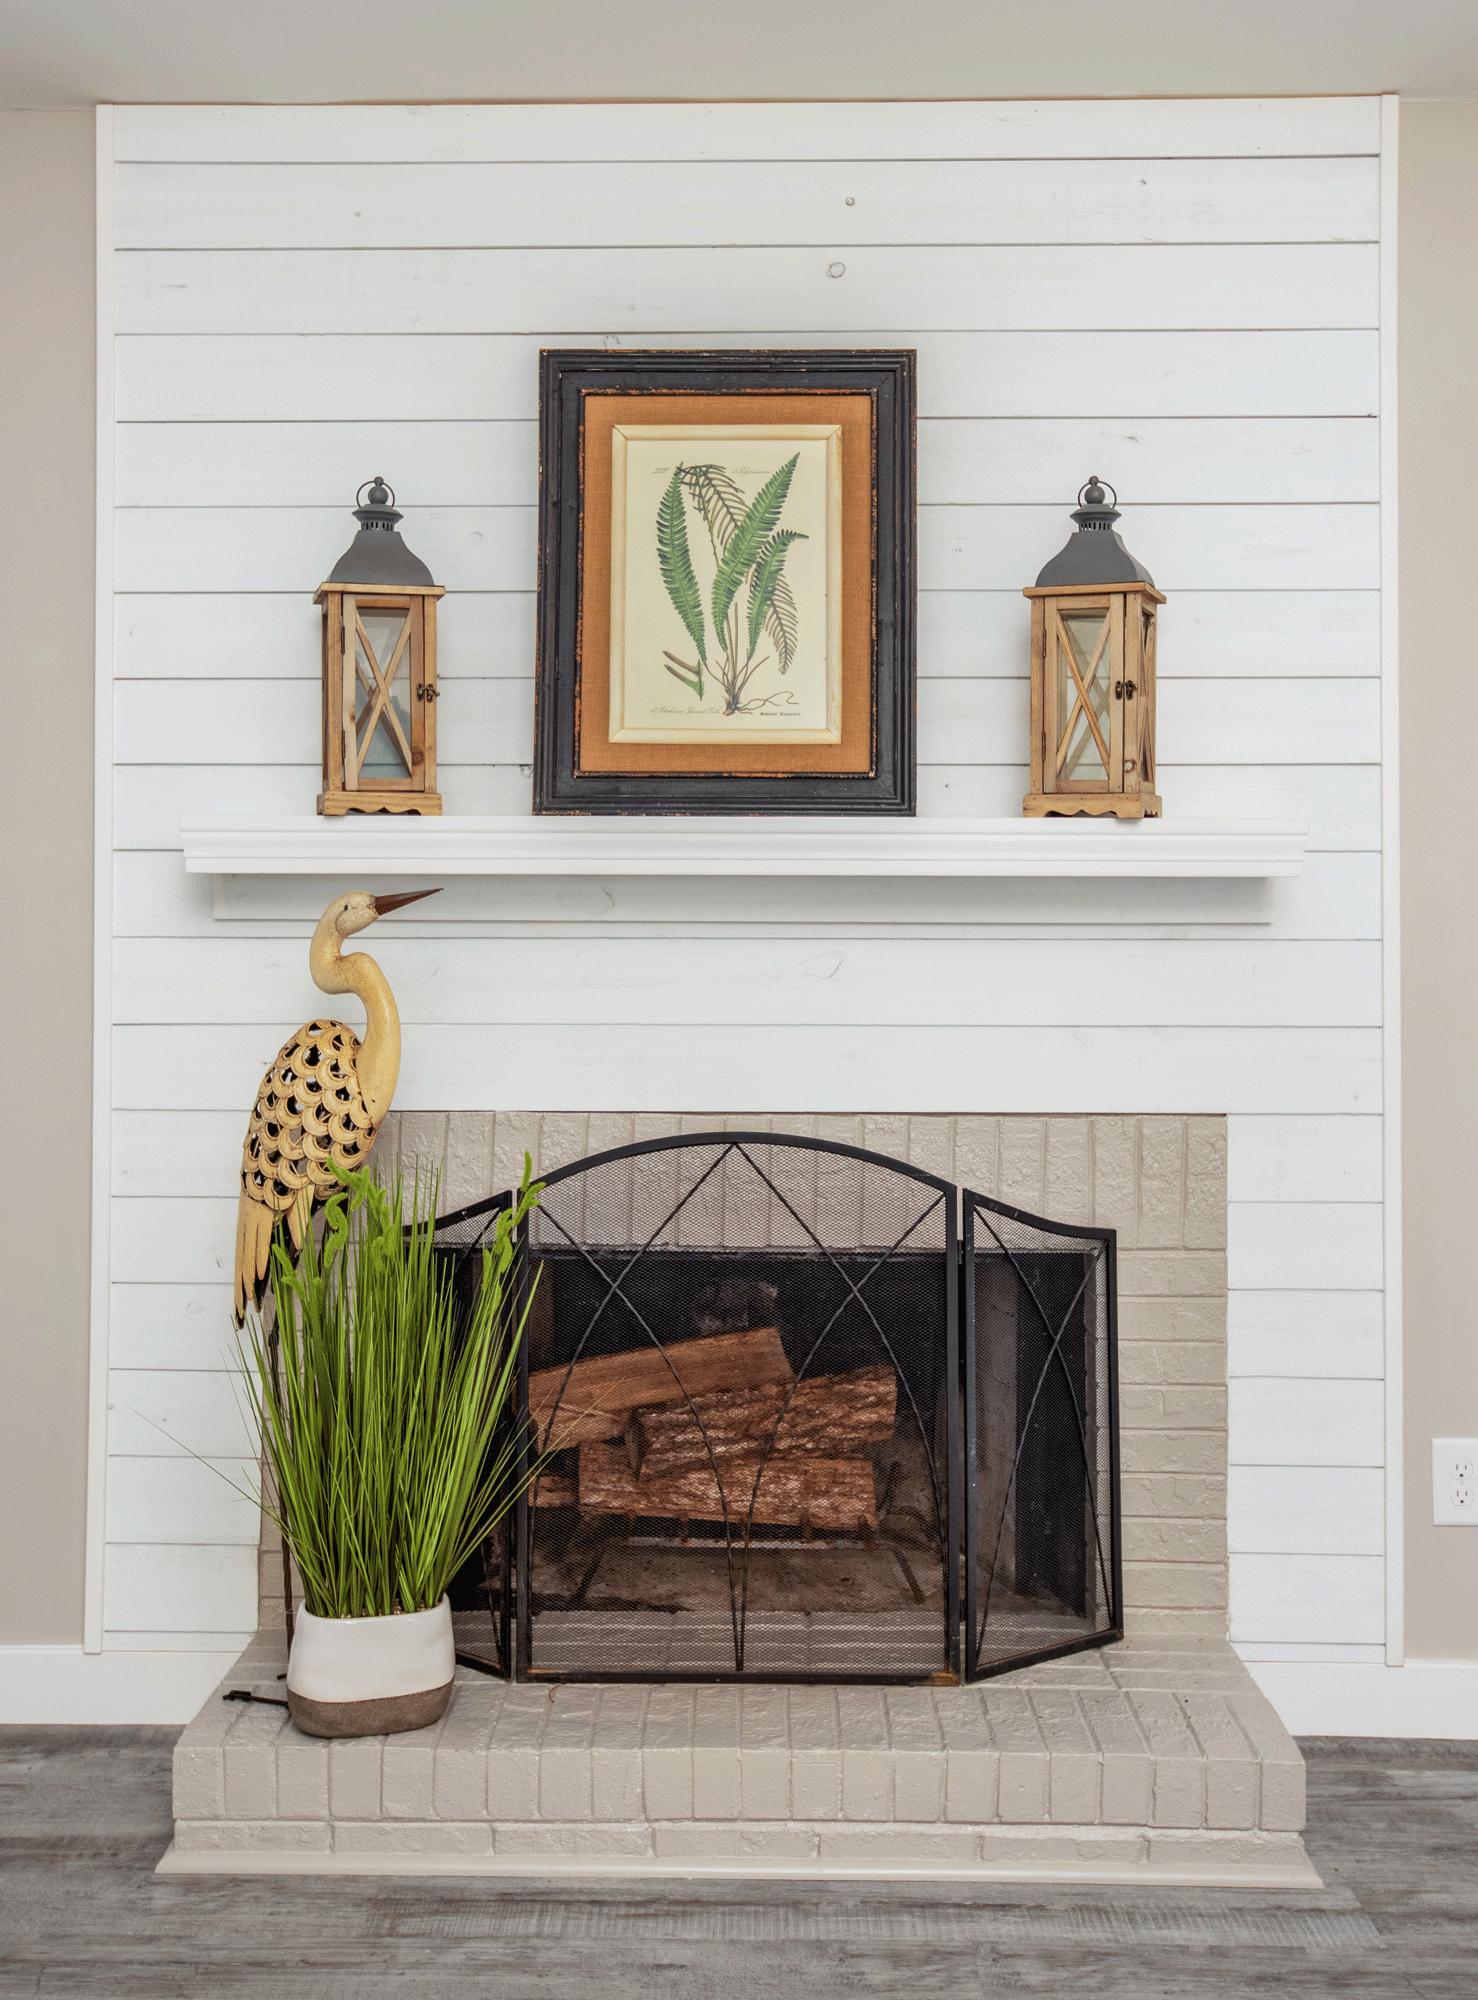 Fireplace mantle decor with artwork, lanterns, crane bird, grass planter